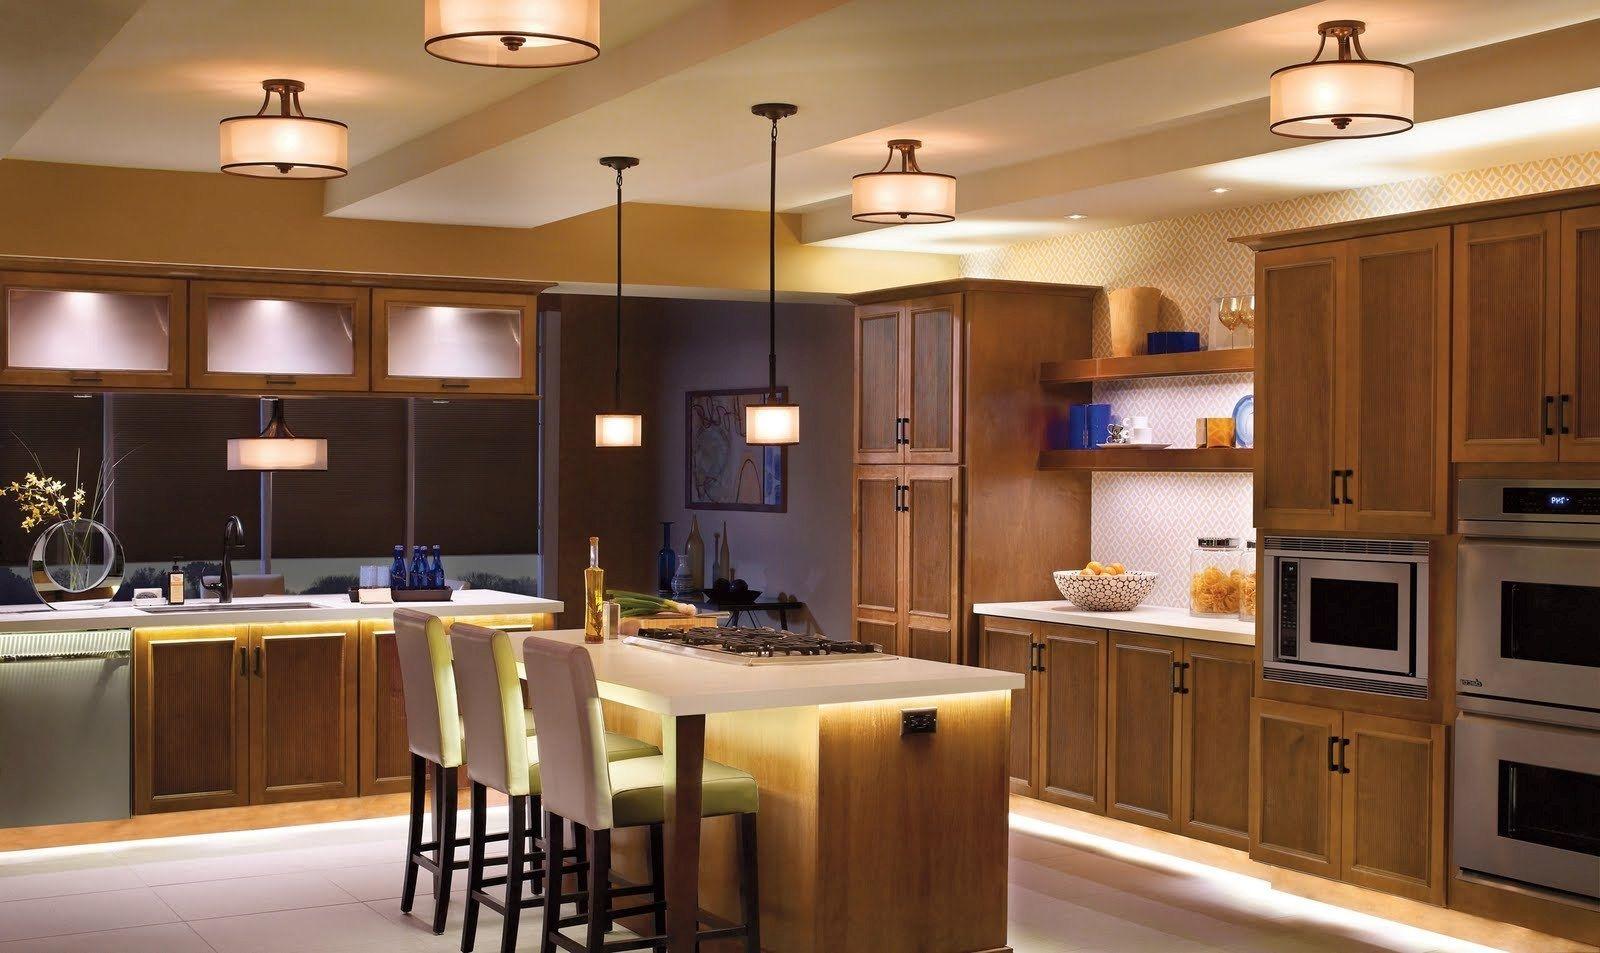 best led lights for kitchen home decorating kitchen lighting rh pinterest co uk Low Profile LED Track Lighting LED Kitchen Ceiling Lights